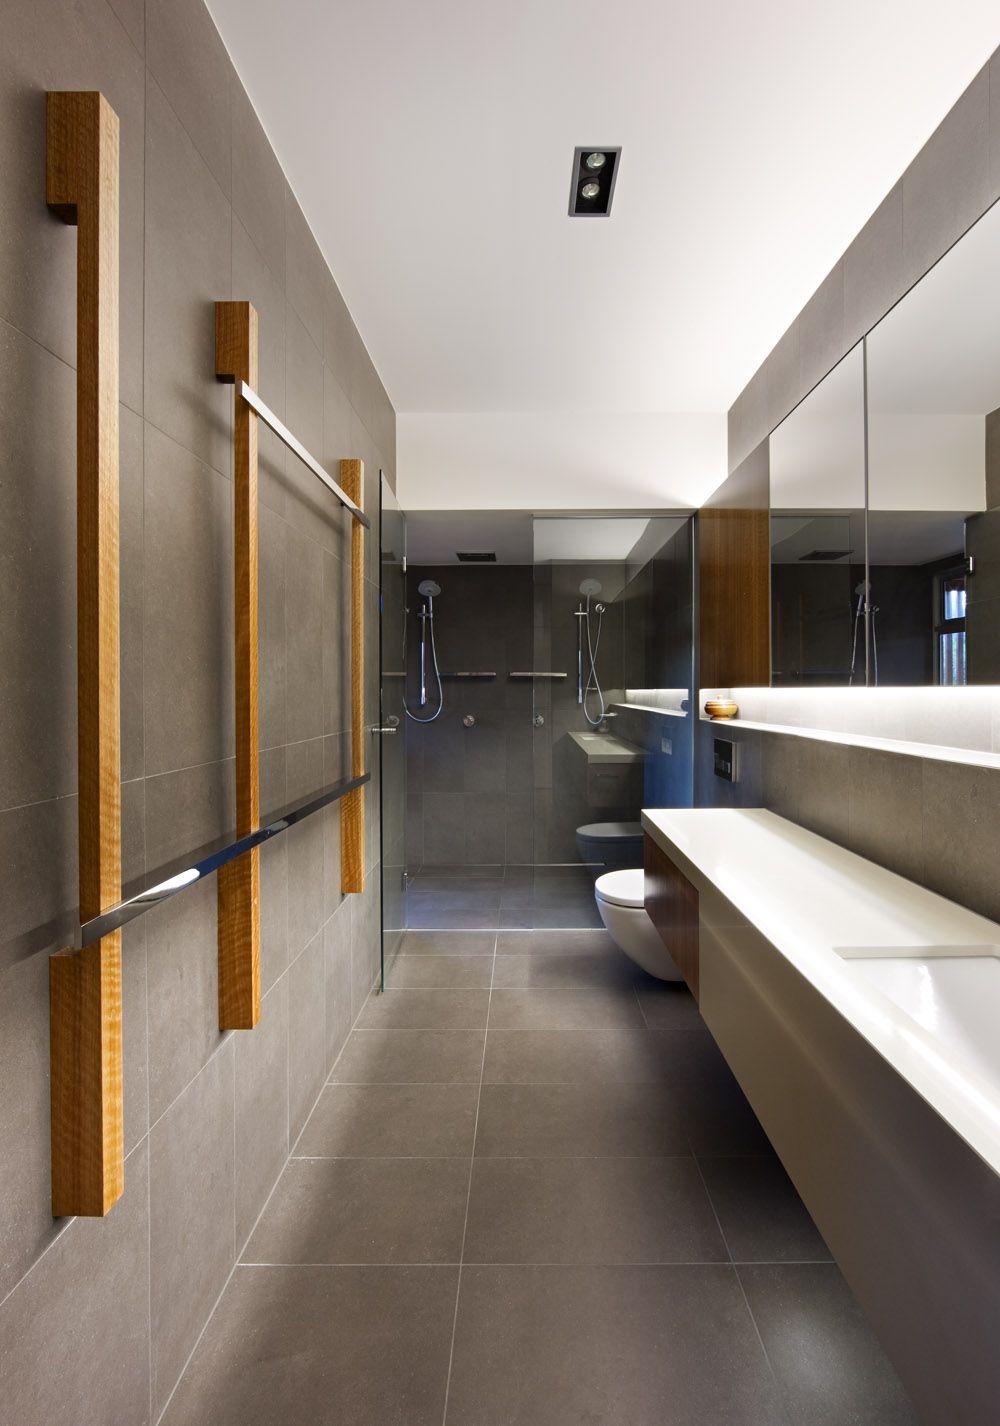 Long Narrow Bathroom Ideas Intended For Long Narrow Bathroom ... on bathroom sinks, bathroom technology, bathroom vanities, bathroom design, bathroom floor plans with dimensions, bathroom bizarre, bathroom decor, bathroom floors and walls, bathroom architecture, bathroom tile, bathroom organizing, bathroom remodeling, bathroom ideas, bathroom shower with seat, bathroom upgrade, bathroom in spanish, bathroom fixtures, bathroom transformation, bathroom cabinets, bathroom mess,